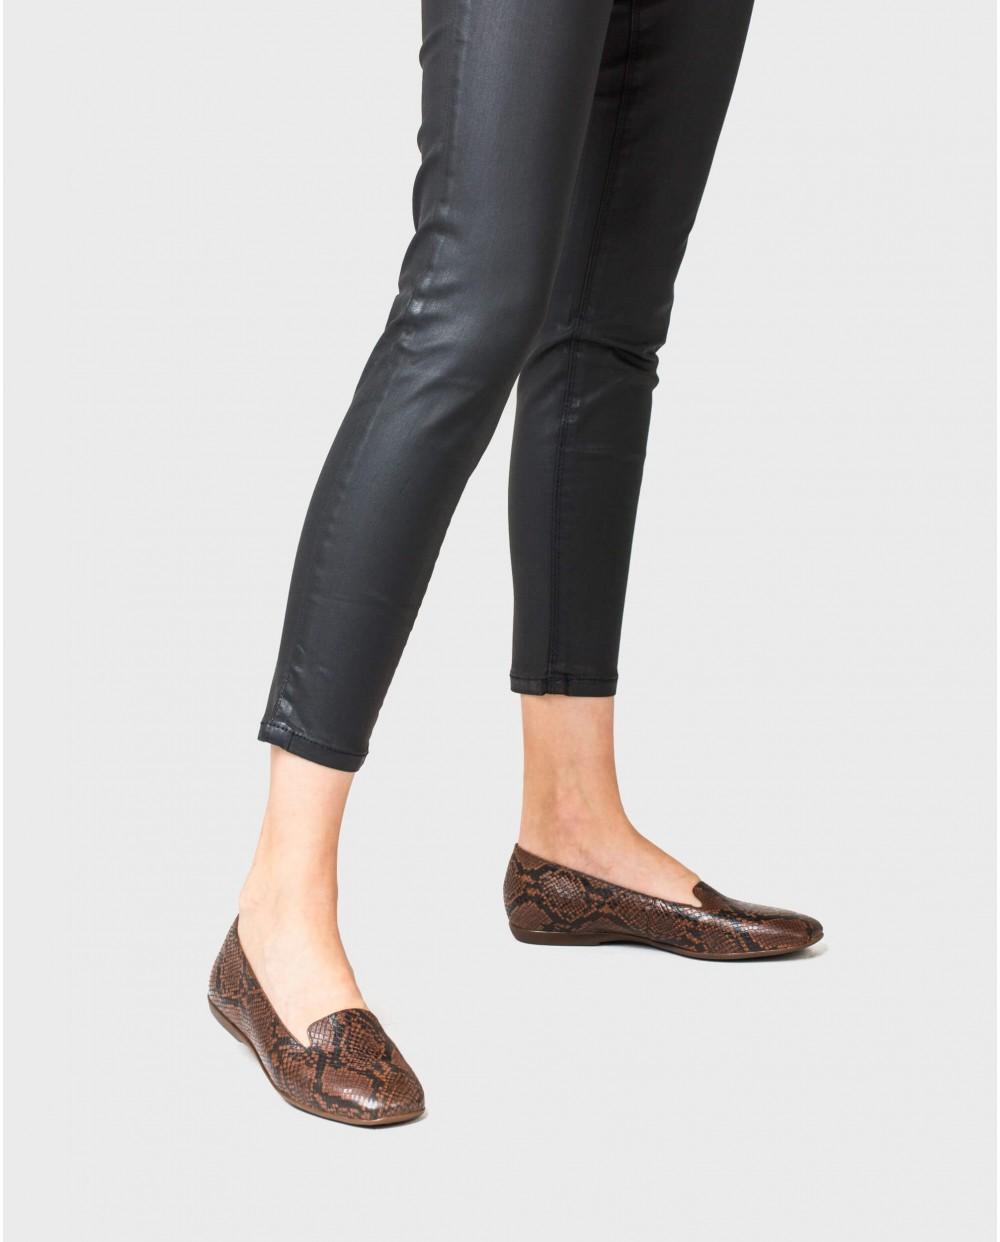 Wonders-Flat Shoes-leather snake print ballet pump